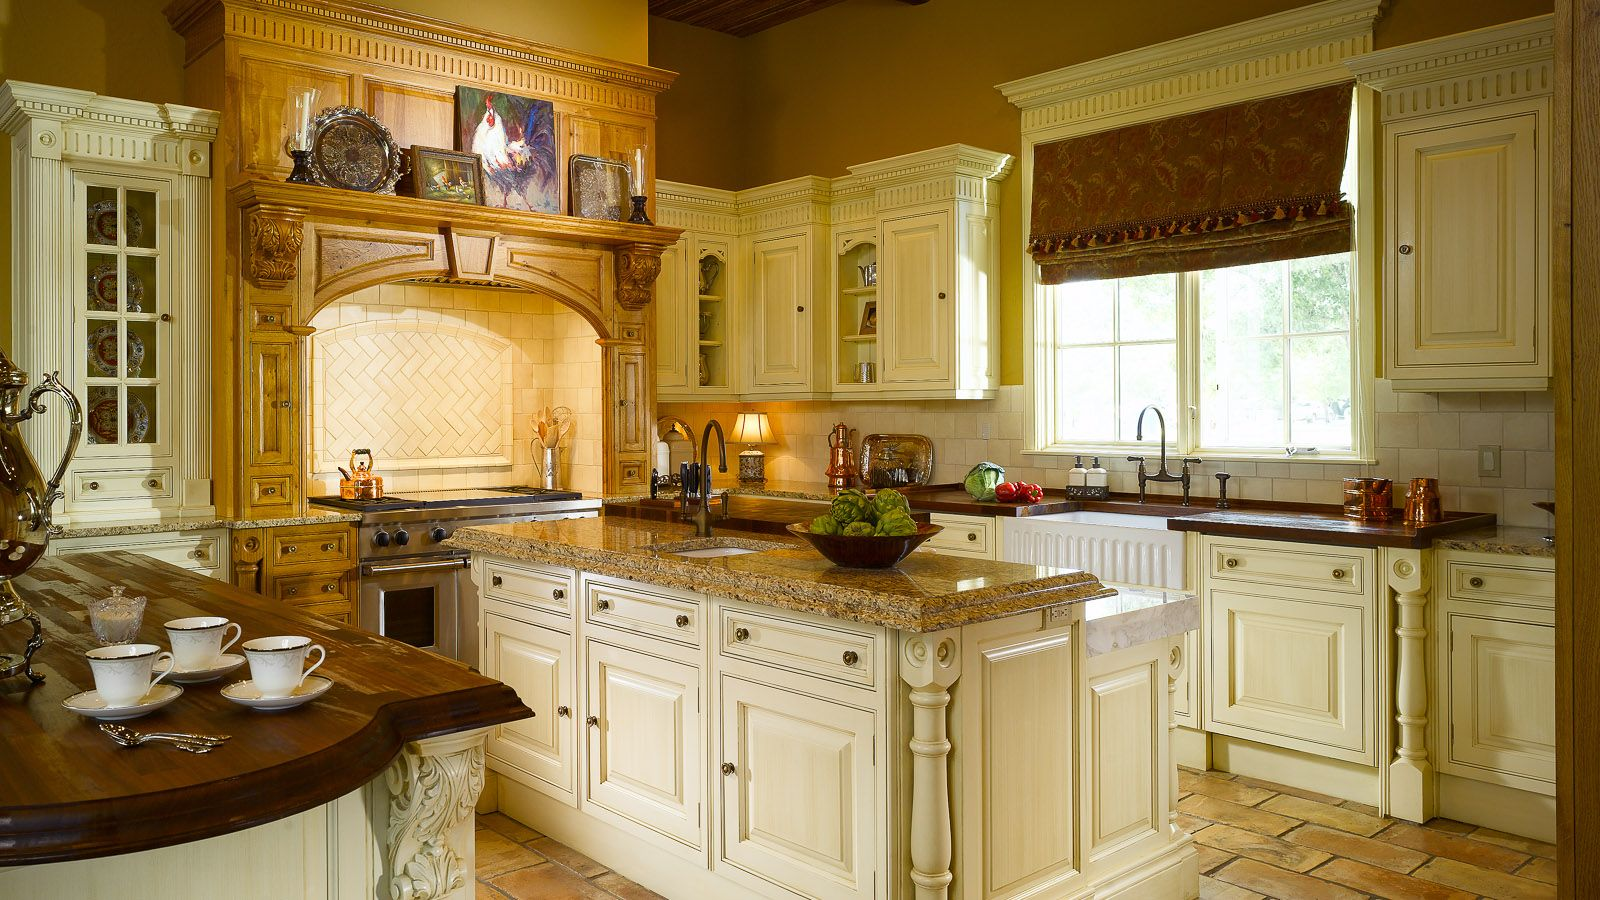 Luxury Kitchen Design In Baton Rouge La Tuscan Kitchen Design